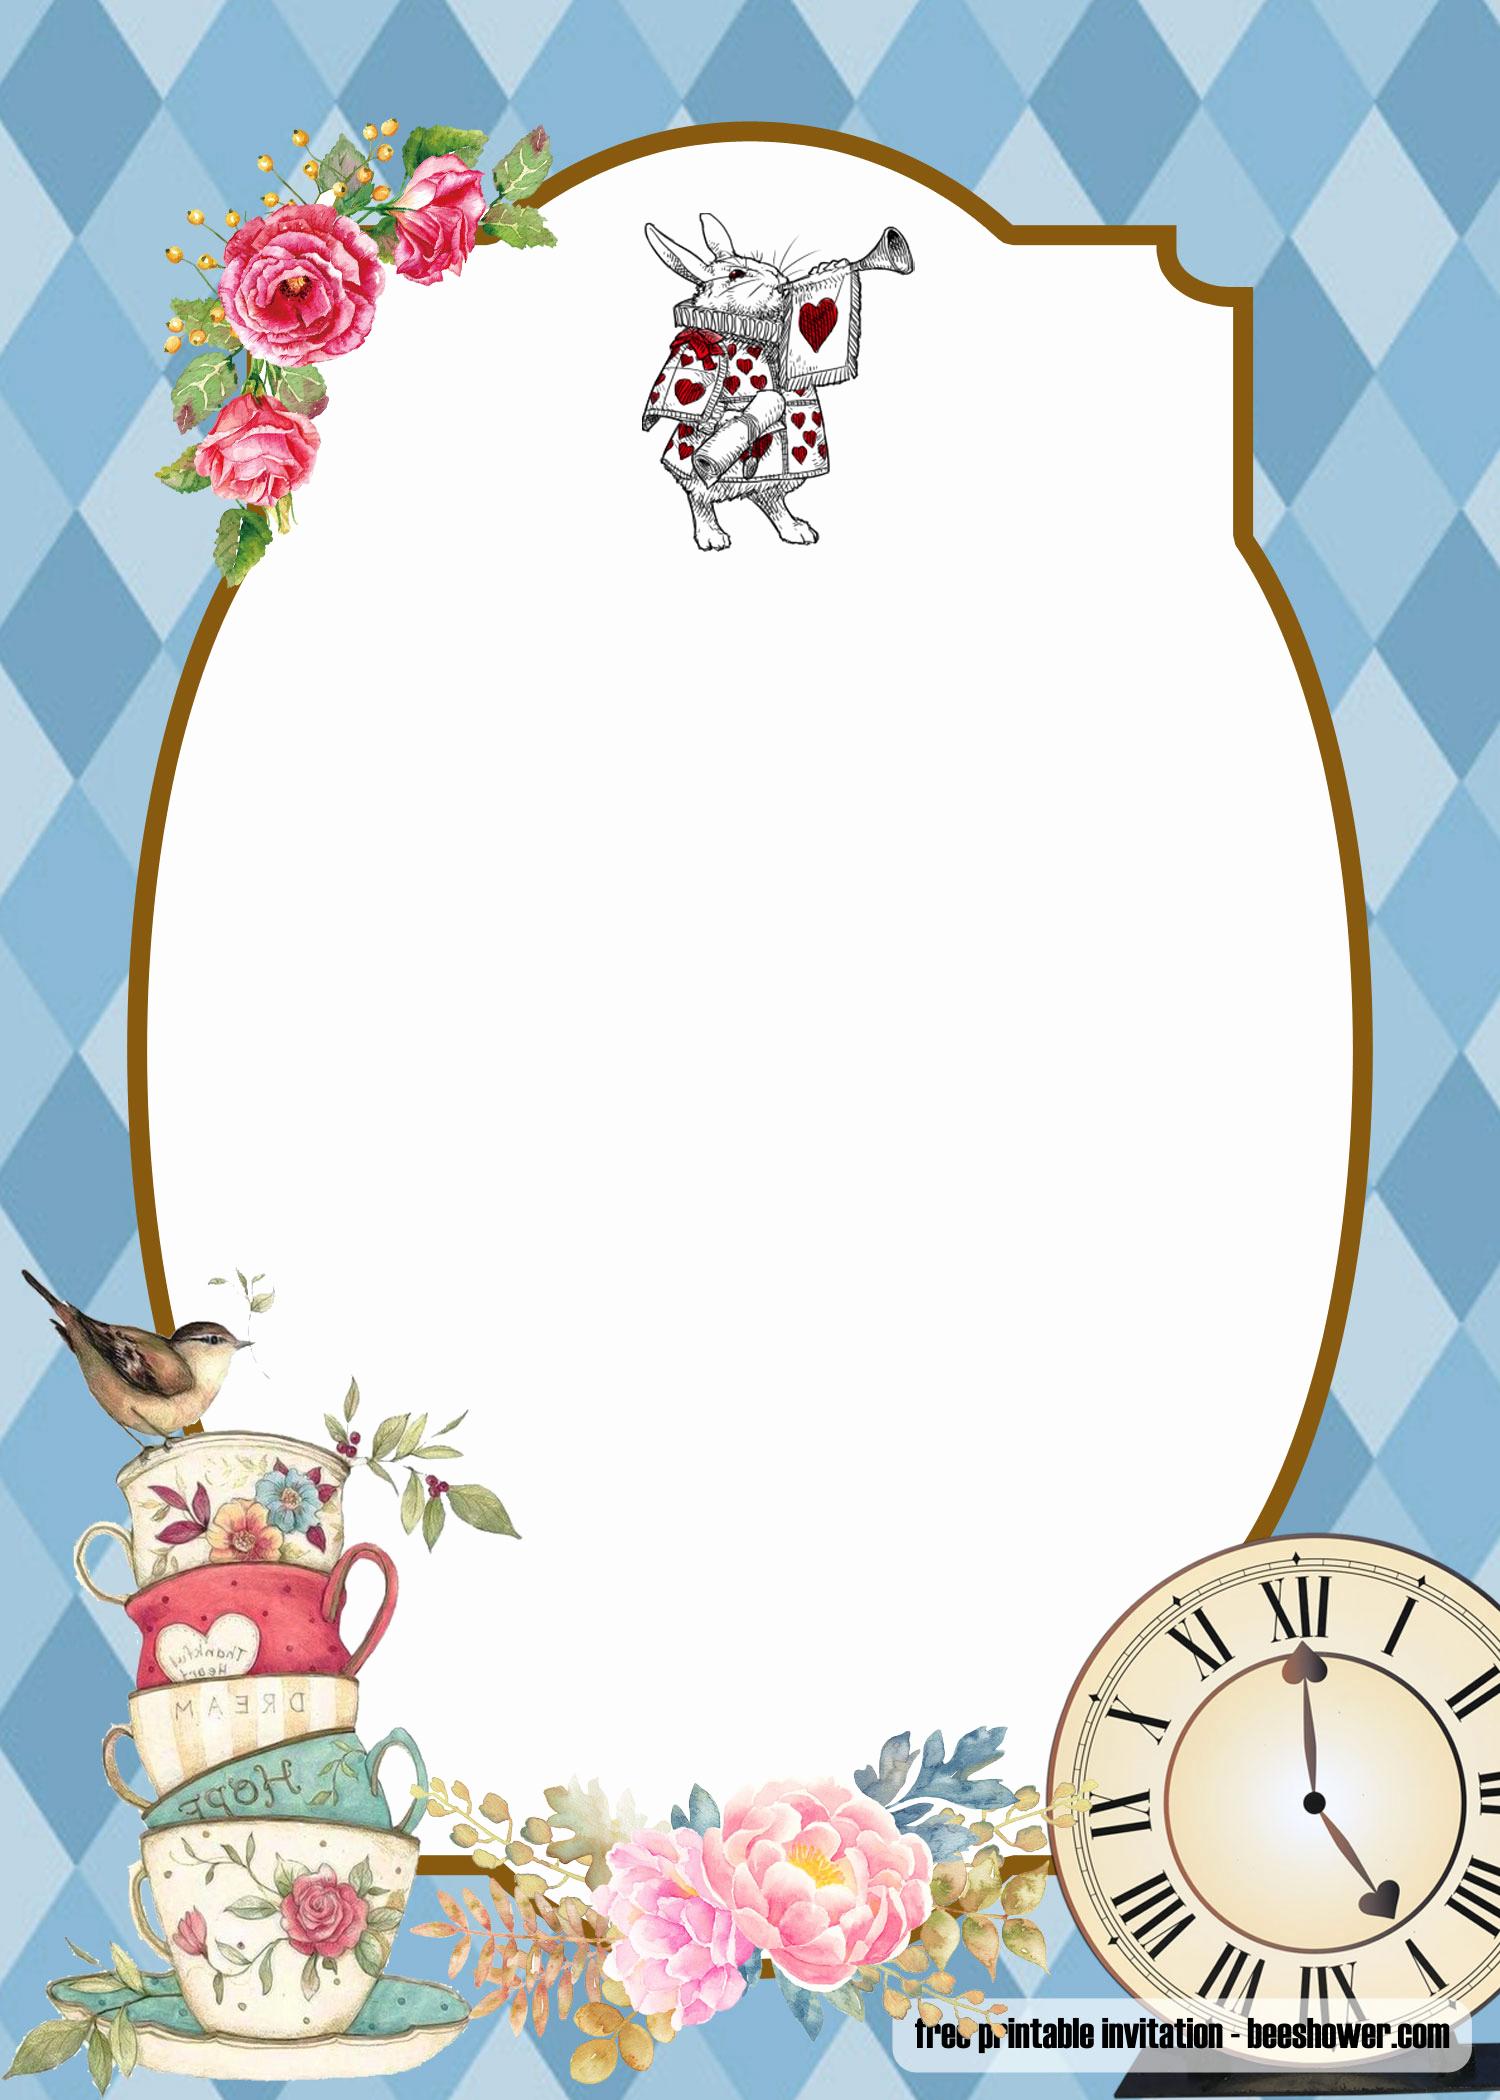 Alice In Wonderland Invitations Templates Lovely Free Alice In Wonderland Baby Shower Invitations Templates